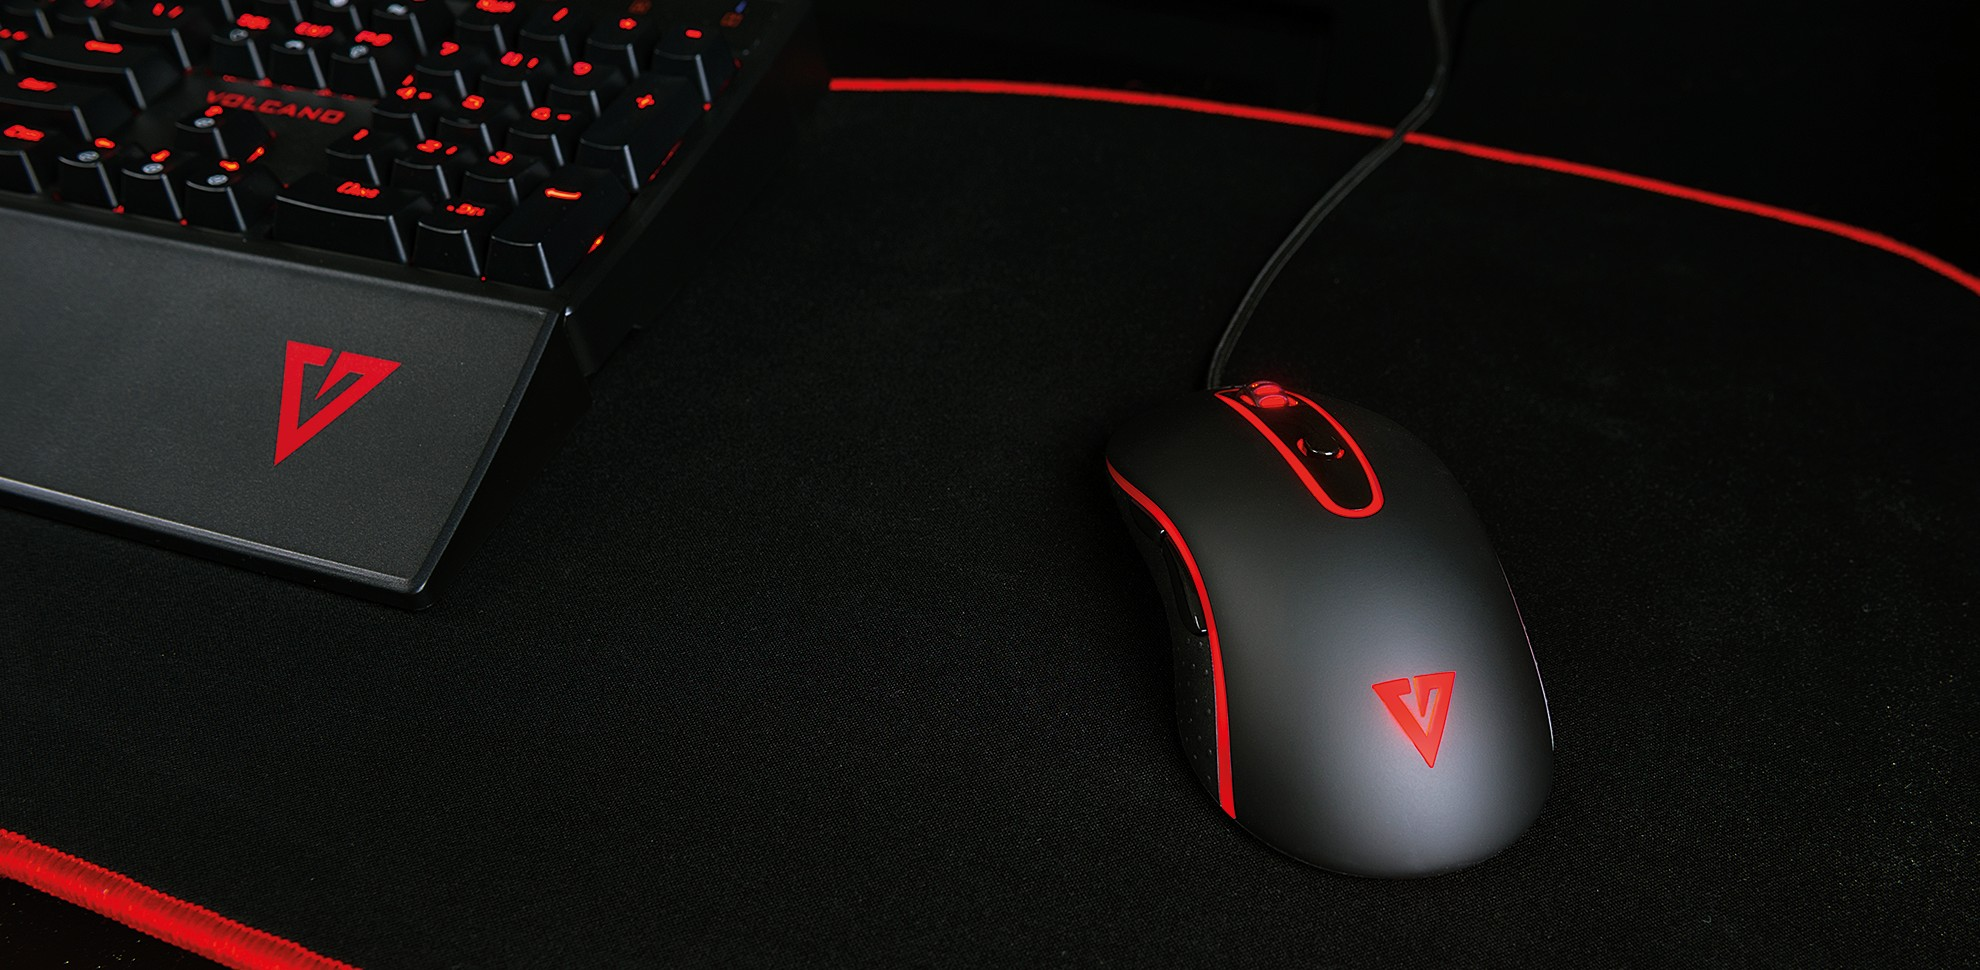 MODECOM Volcano MC-GMX2 black optical wired mouse RGB | 7200 DPI